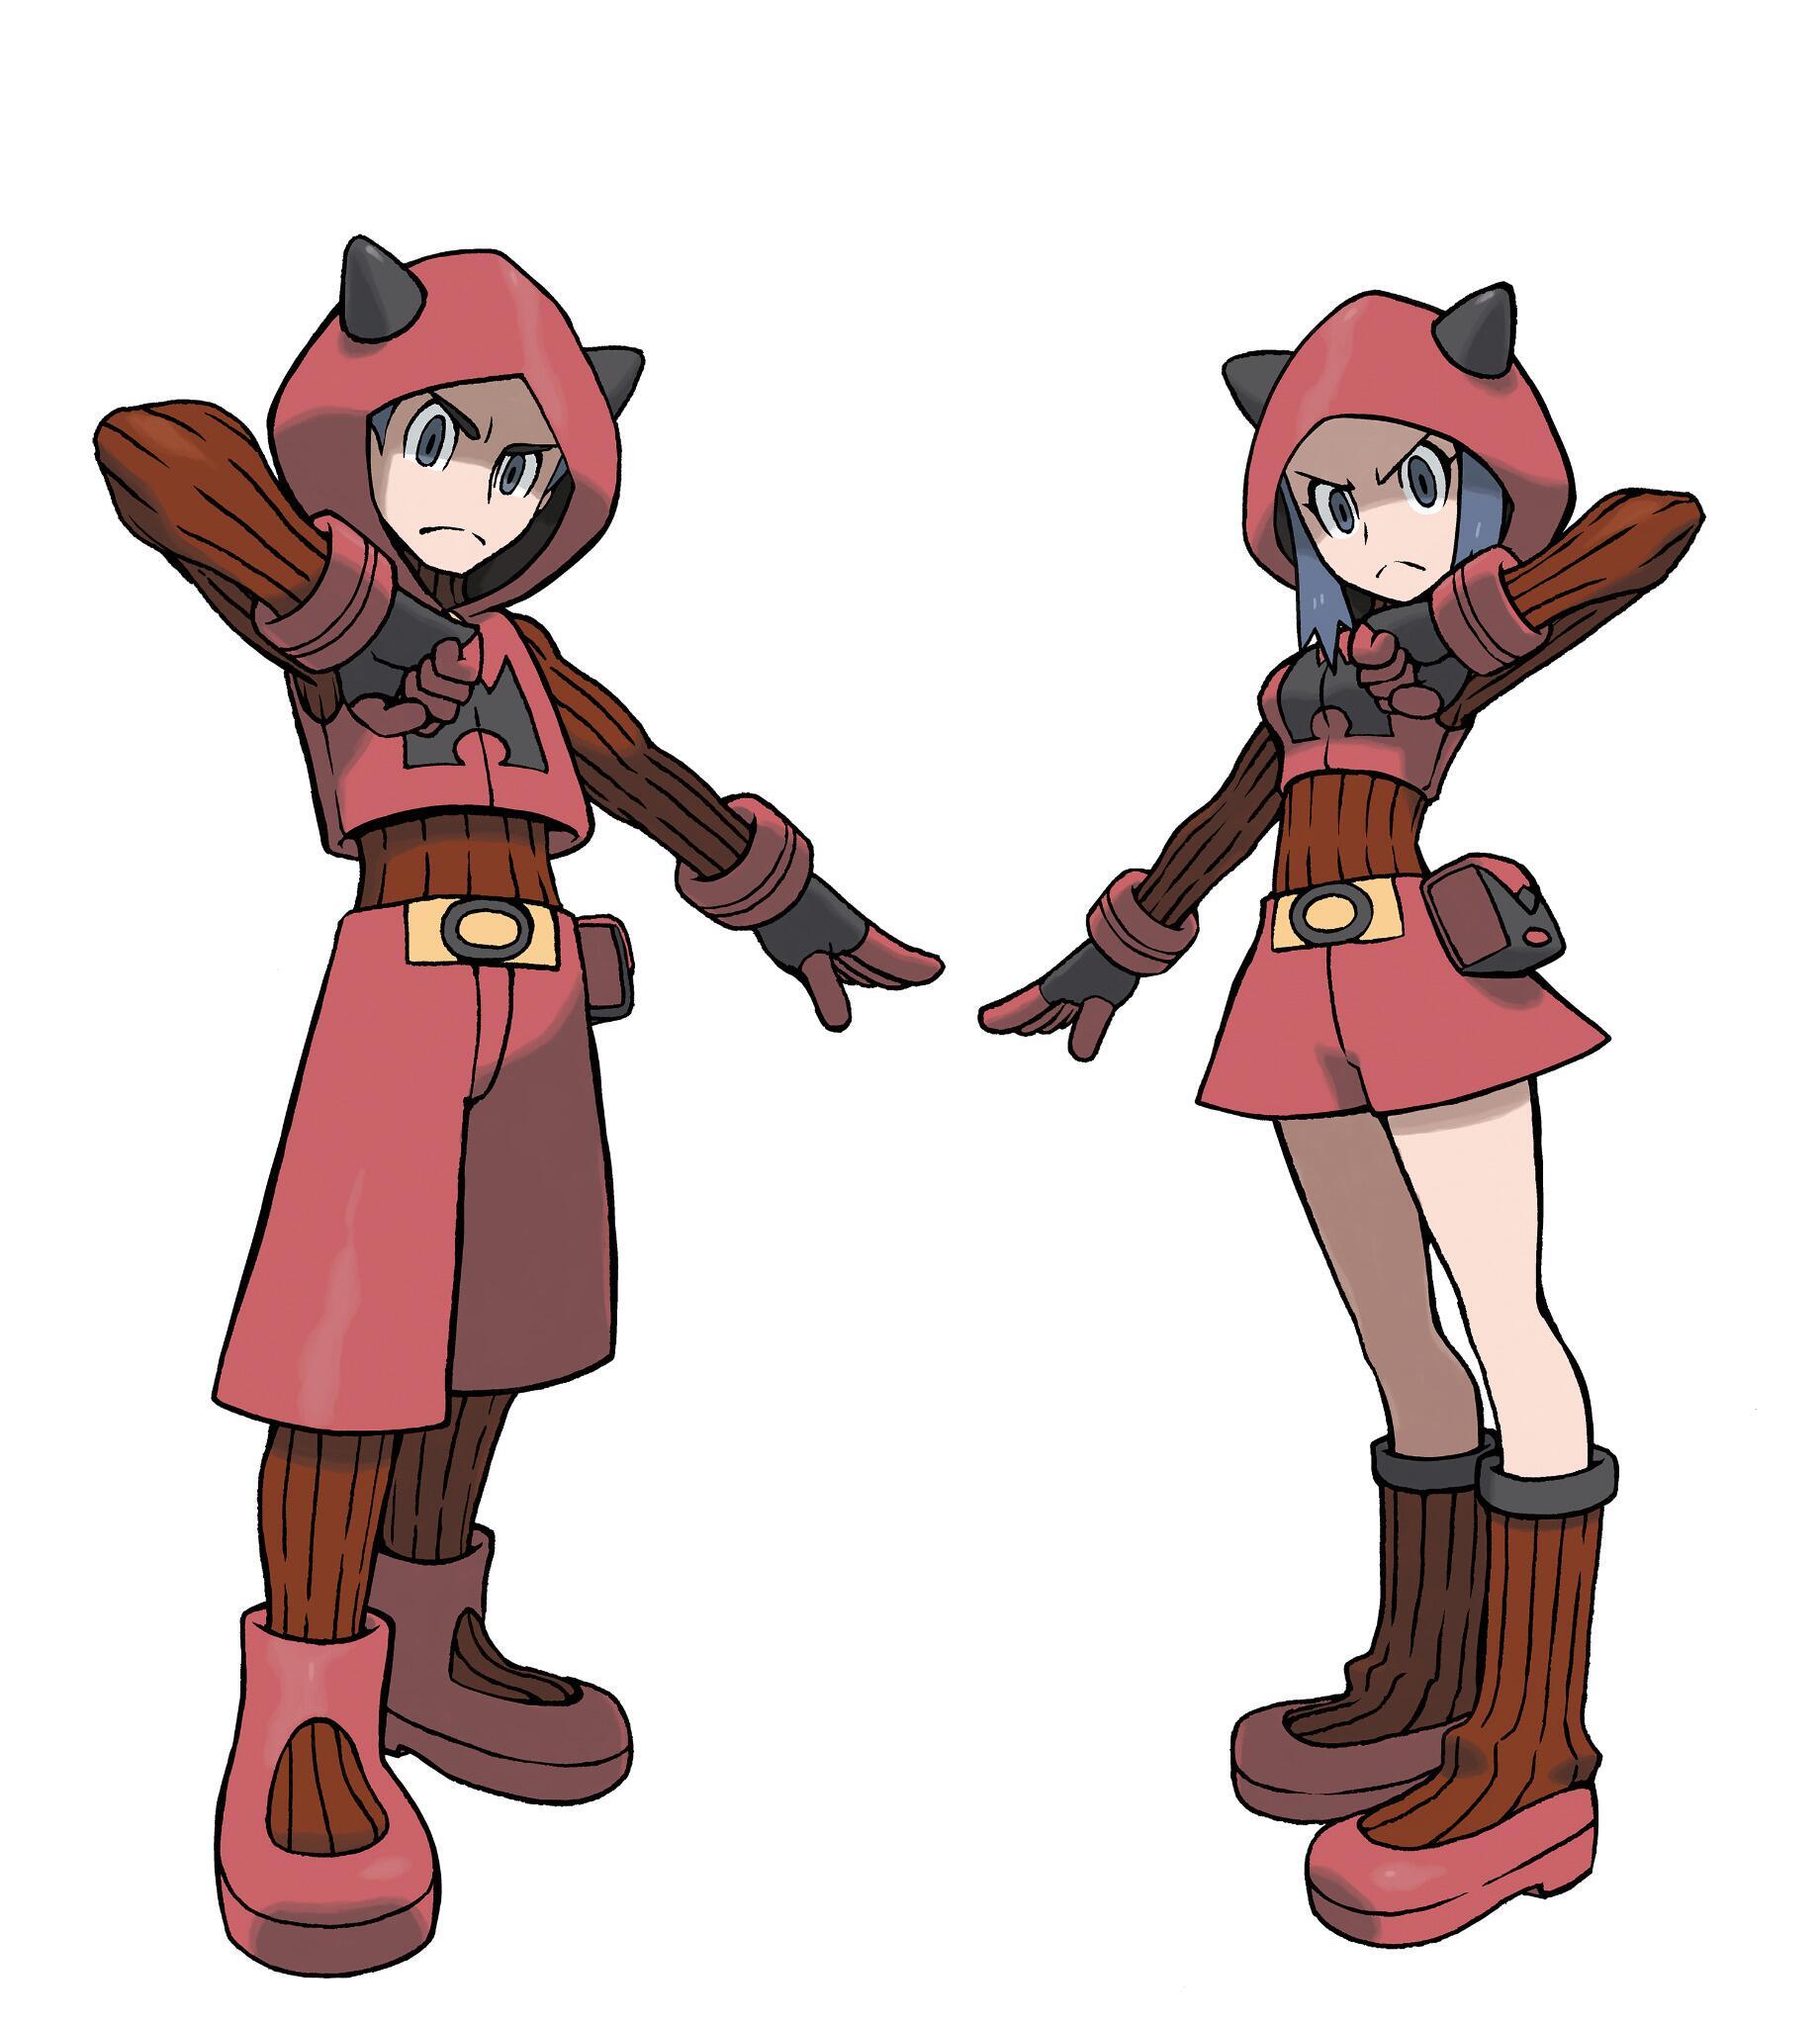 [Discusión General] Pokémon Rubí Omega & Zafiro Alfa - Página 2 Bp75QE0IMAAOWYX